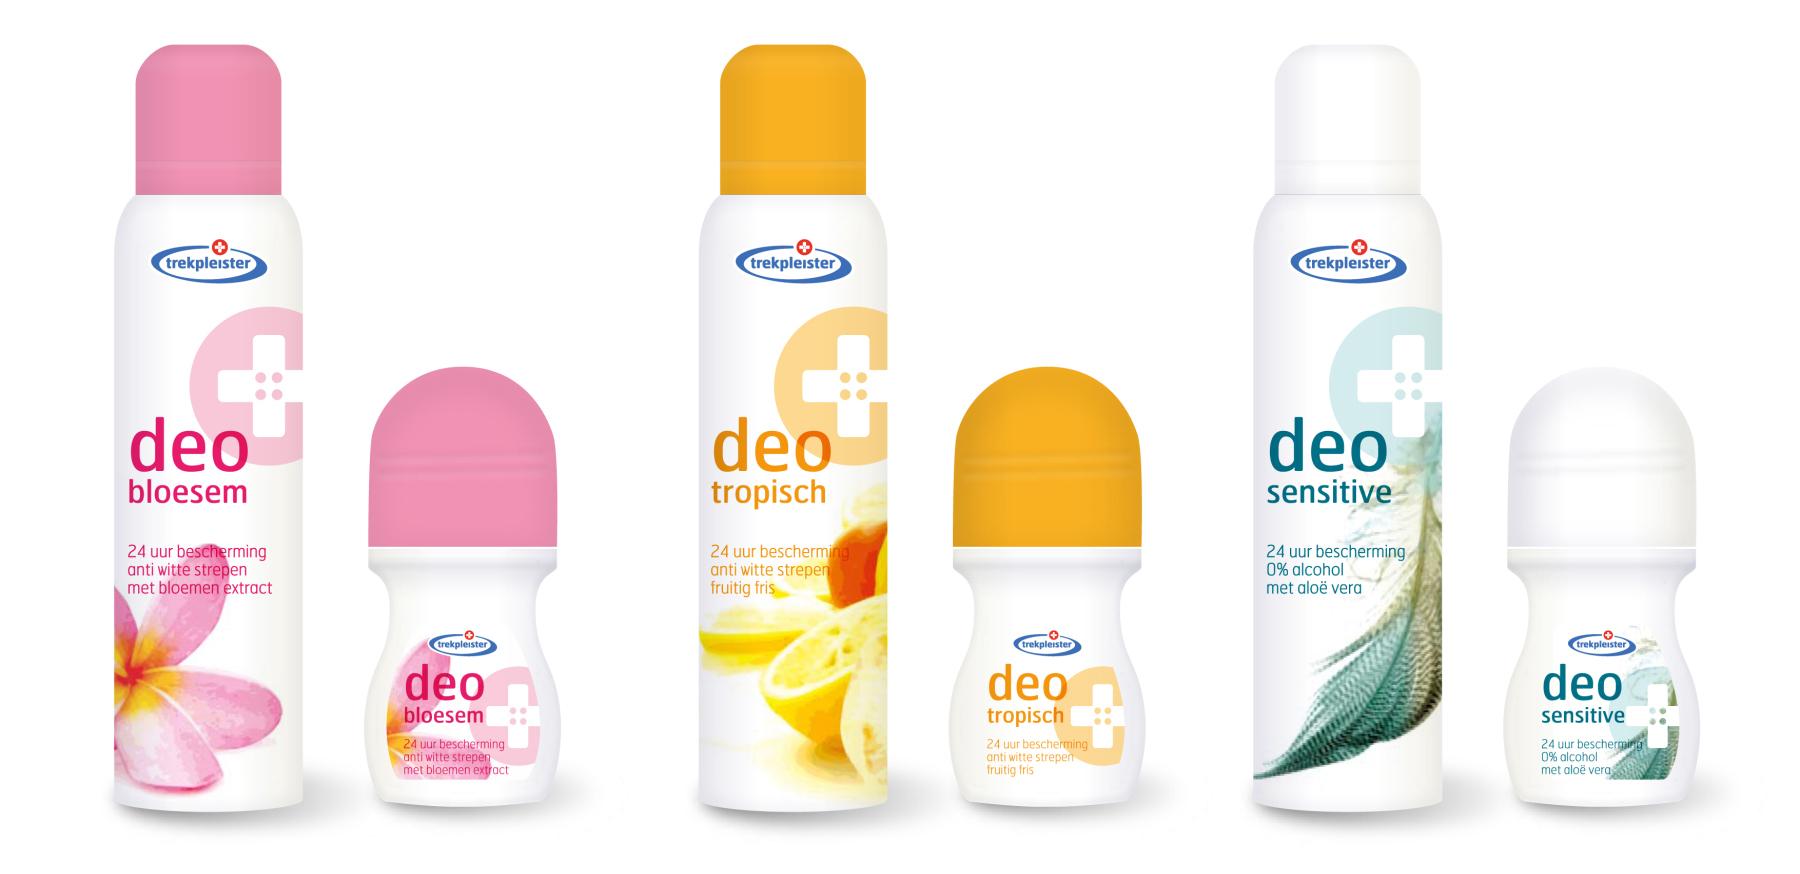 trekpleister deodorant